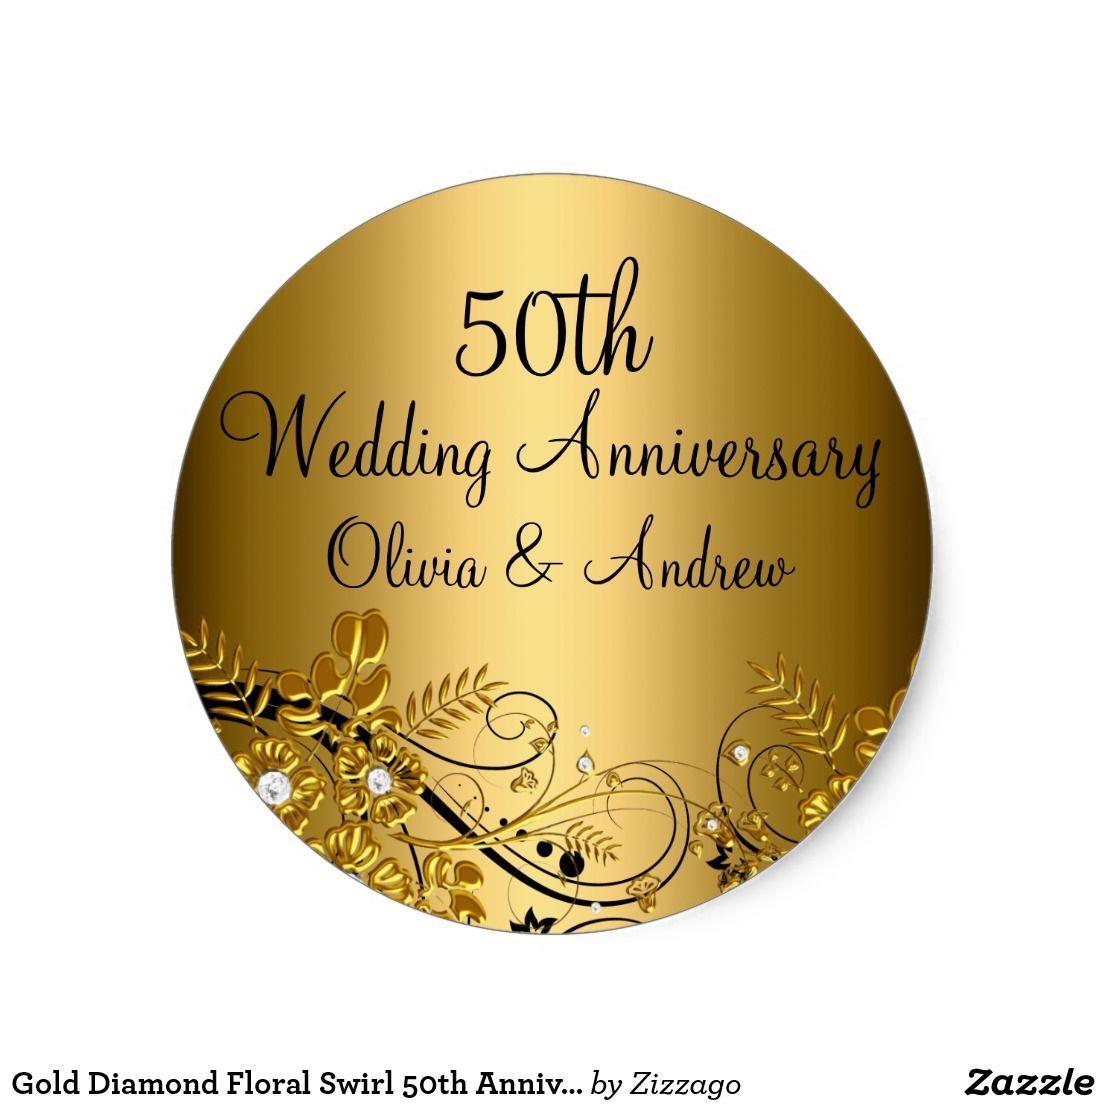 Gold Diamond Floral Swirl 50th Anniversary Sticker Zazzle Com 50th Wedding Anniversary Gold Swirl 50th Anniversary